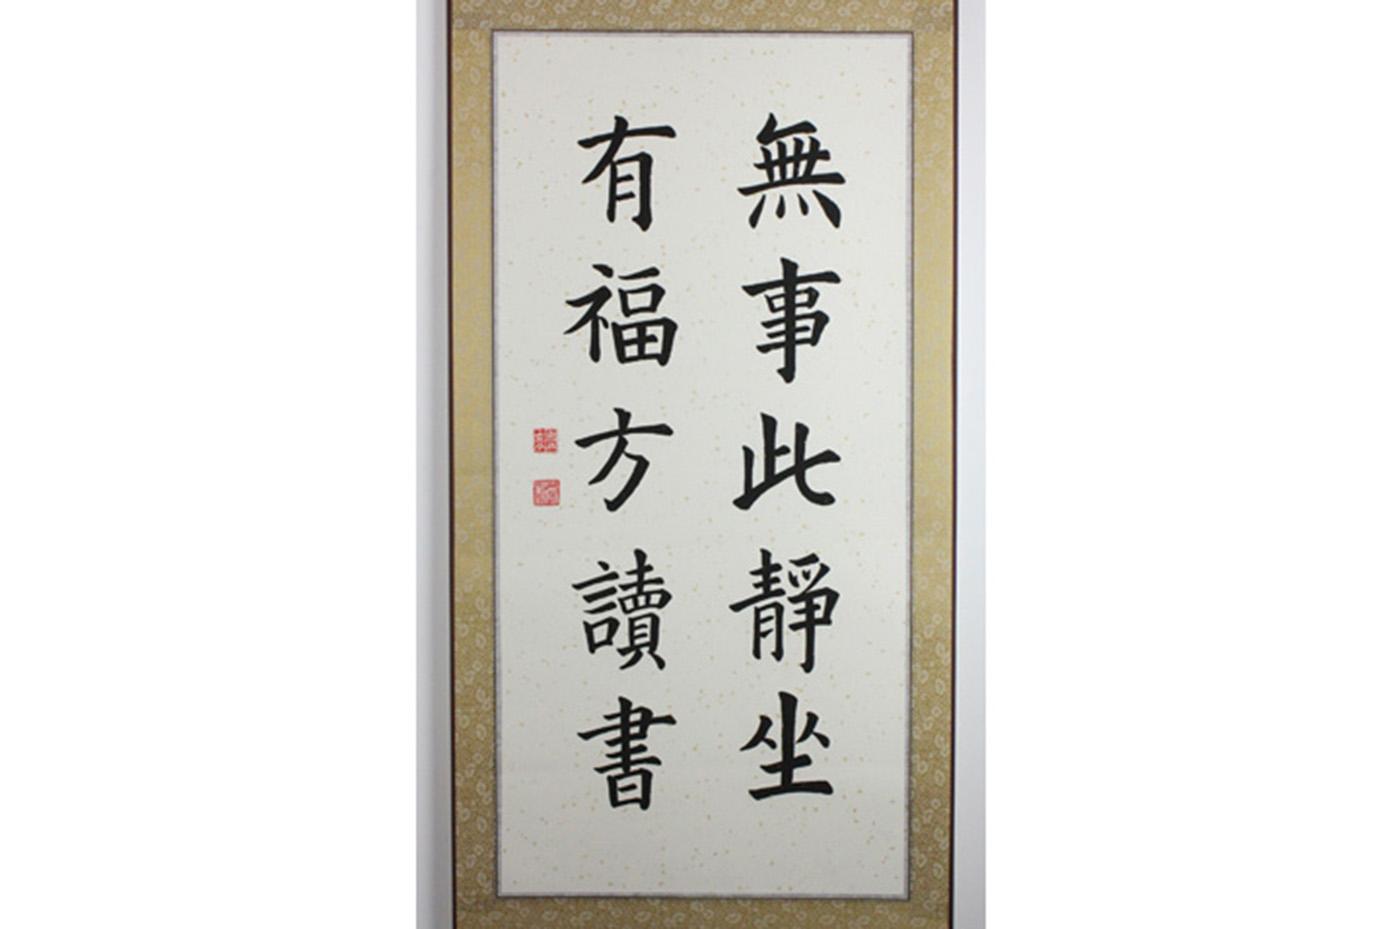 Calligraphie lecture